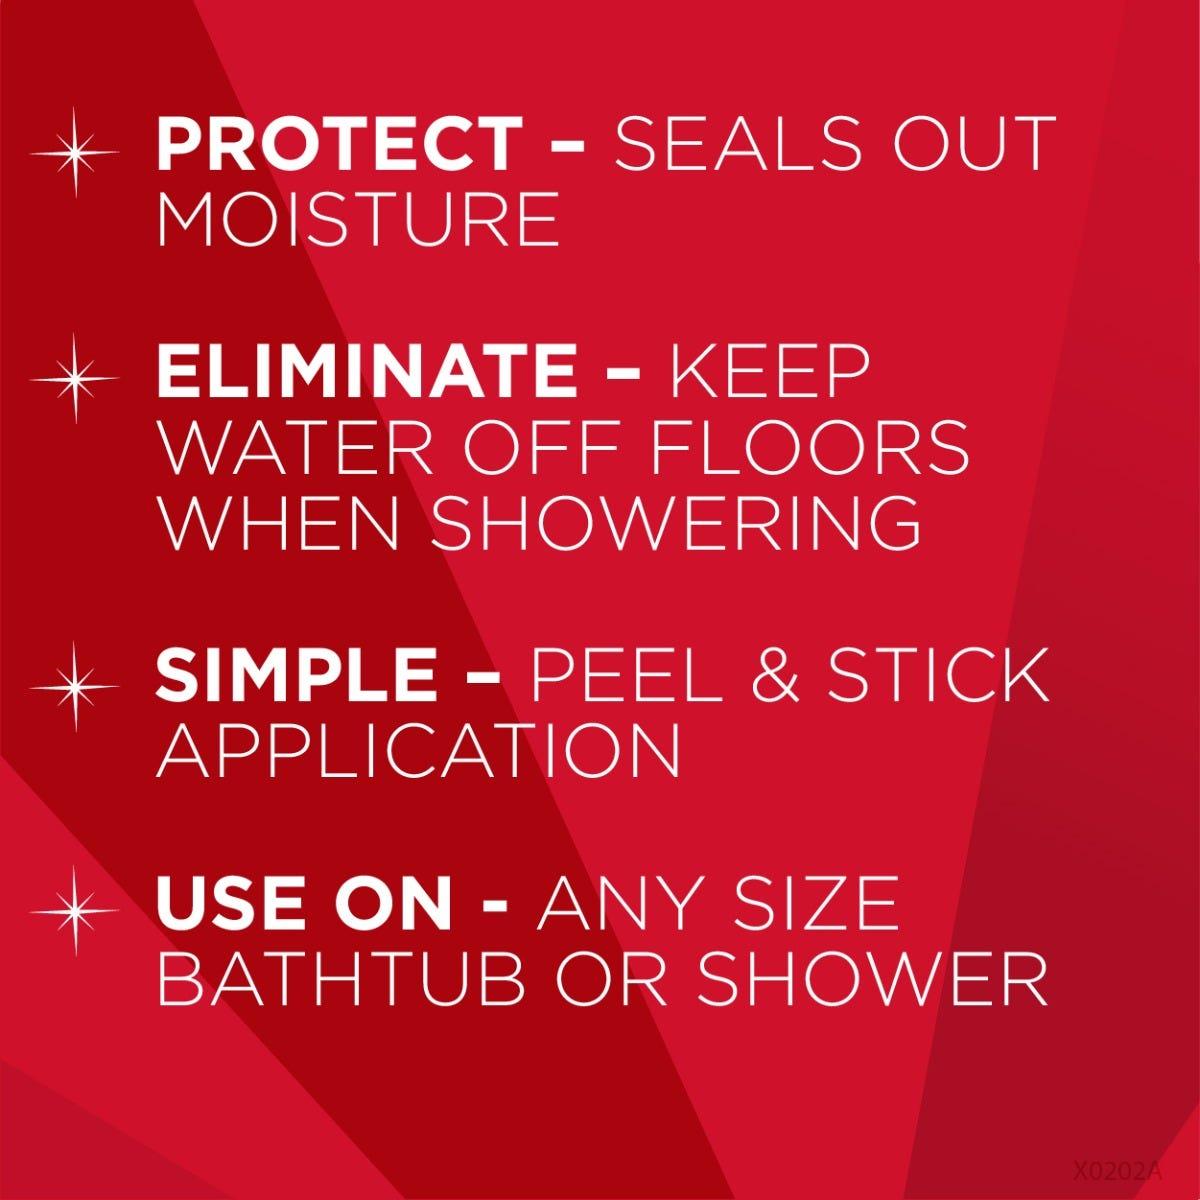 https://googone.com/media/catalog/product/s/p/splash_guard_kit_benefits.jpg